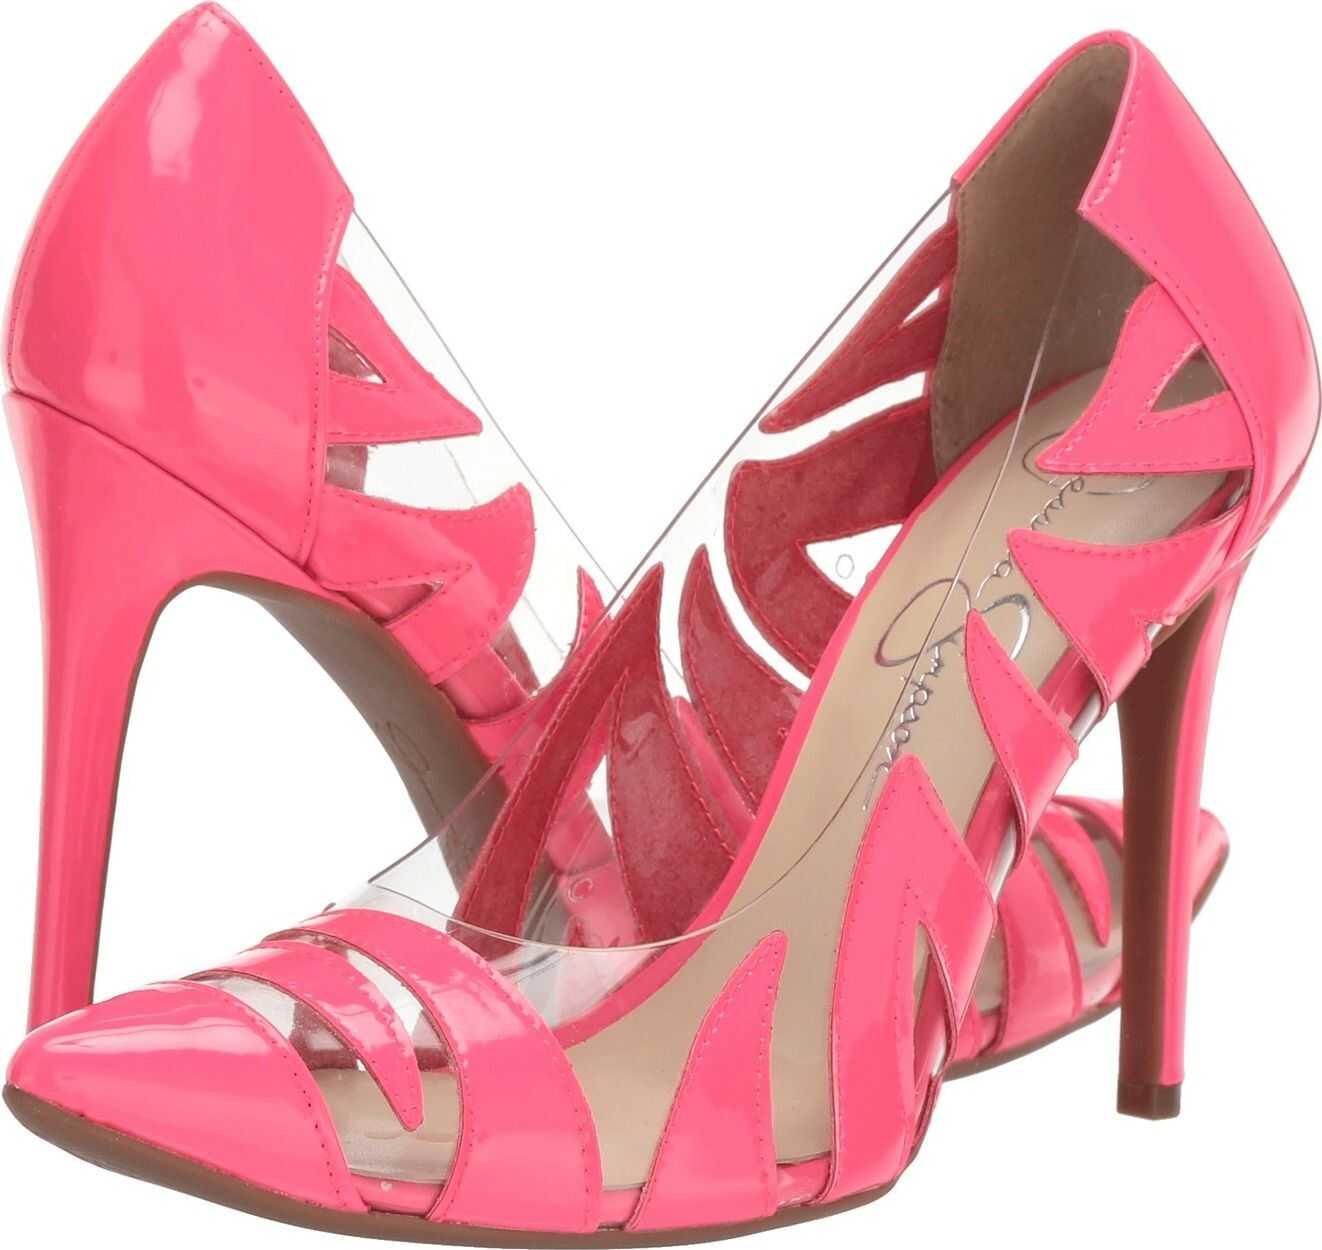 Jessica Simpson Palmra Neon Pink Moda Patent